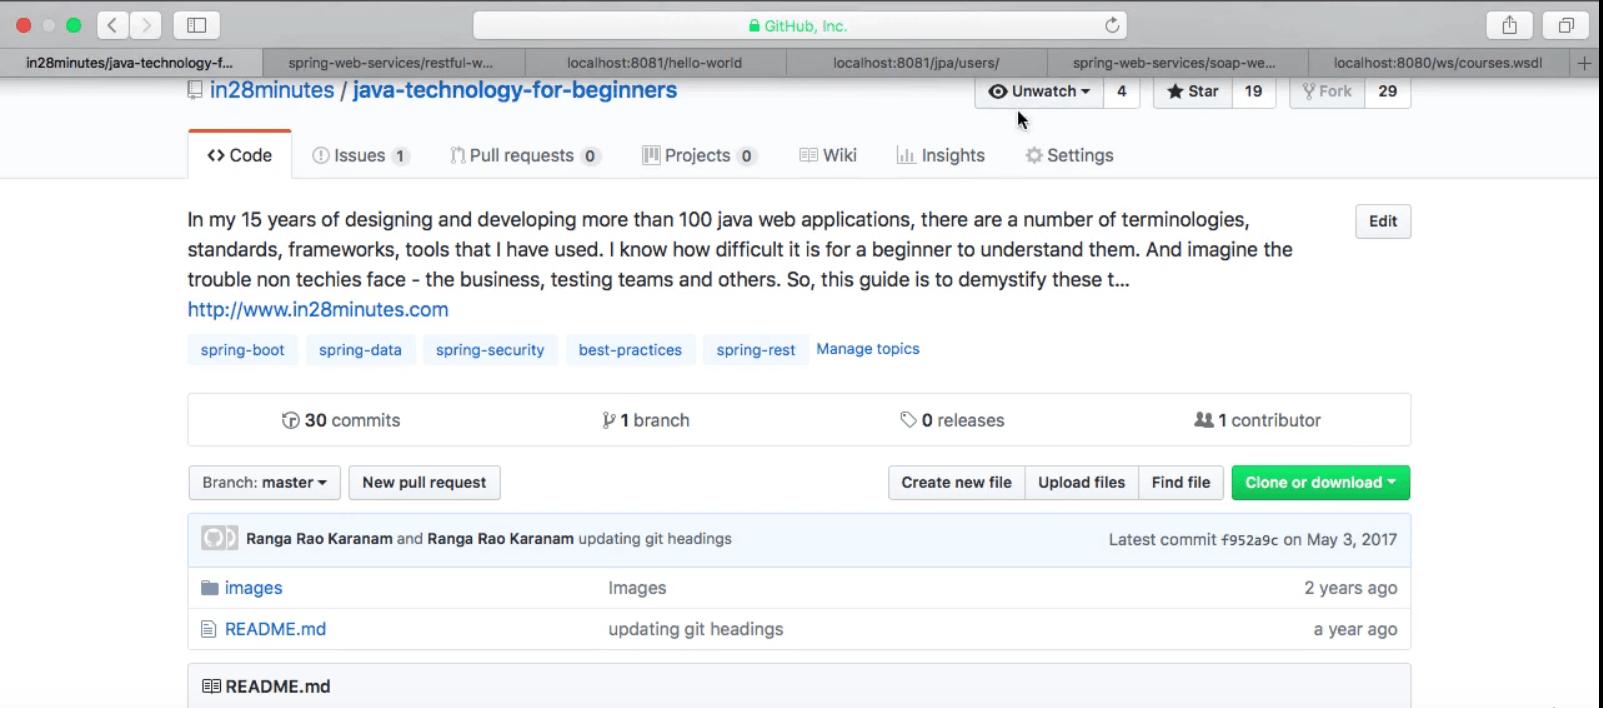 Screenshot of a GitHub webpage